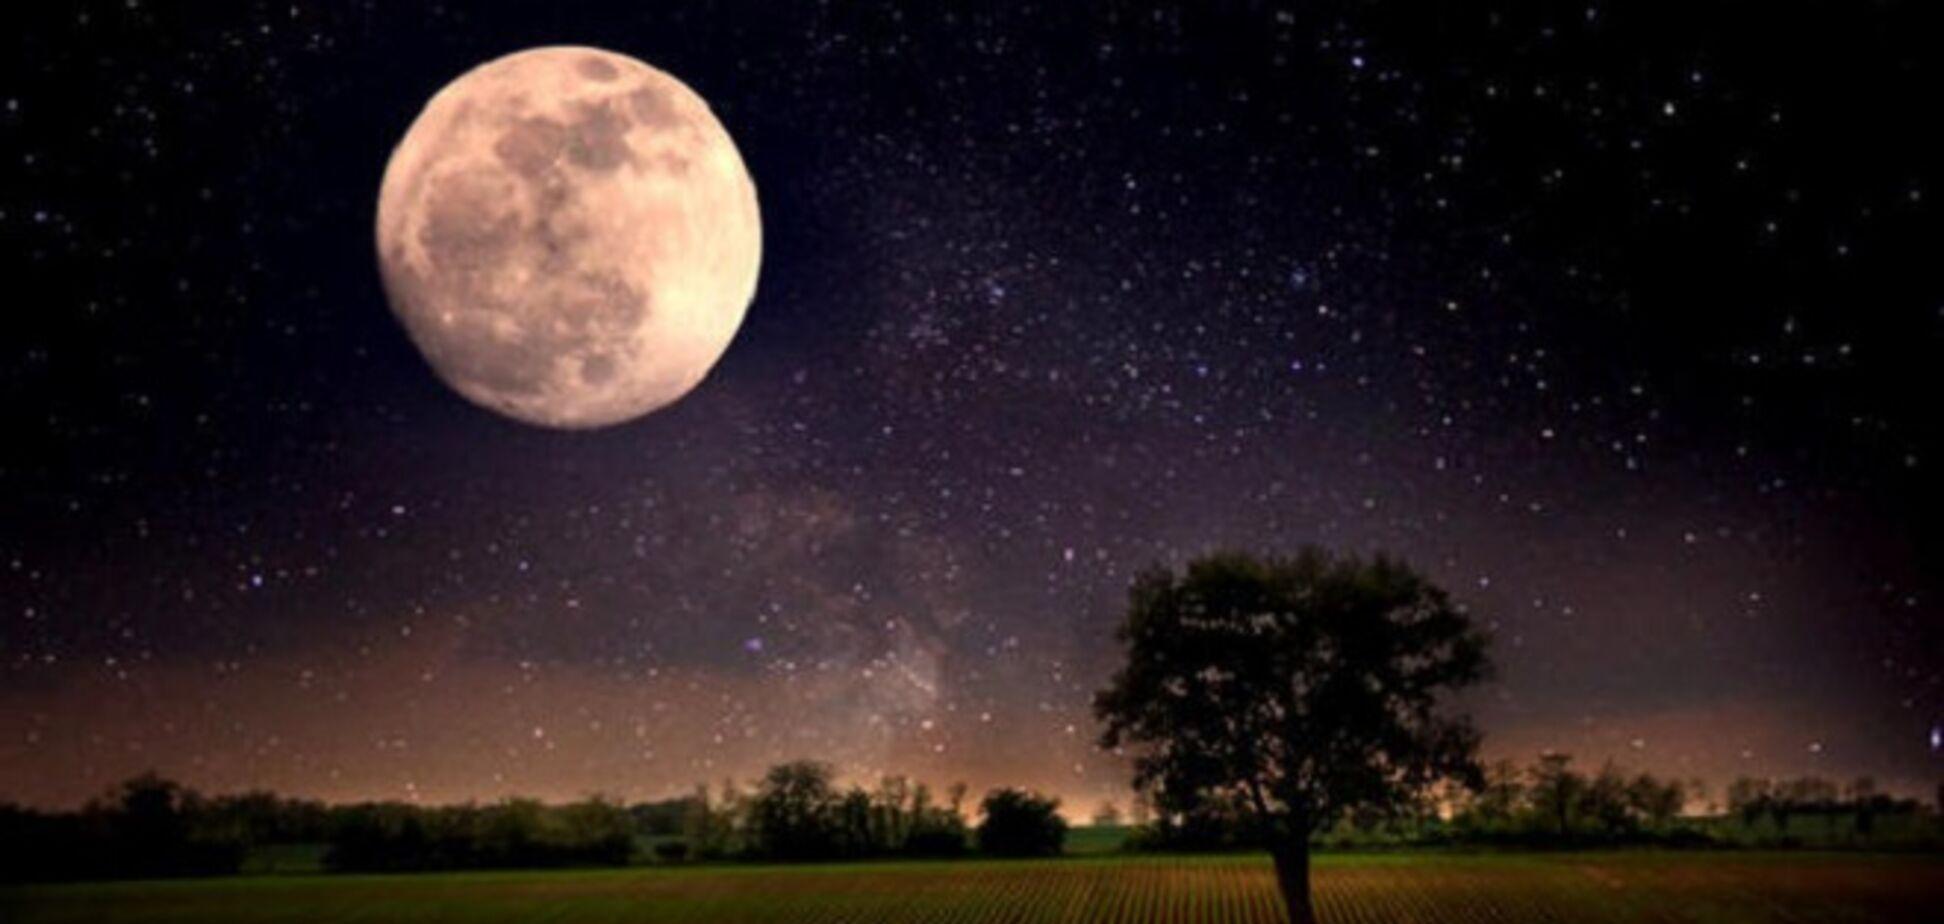 Полнолуние 2019: как повлияет на знаки Зодиака